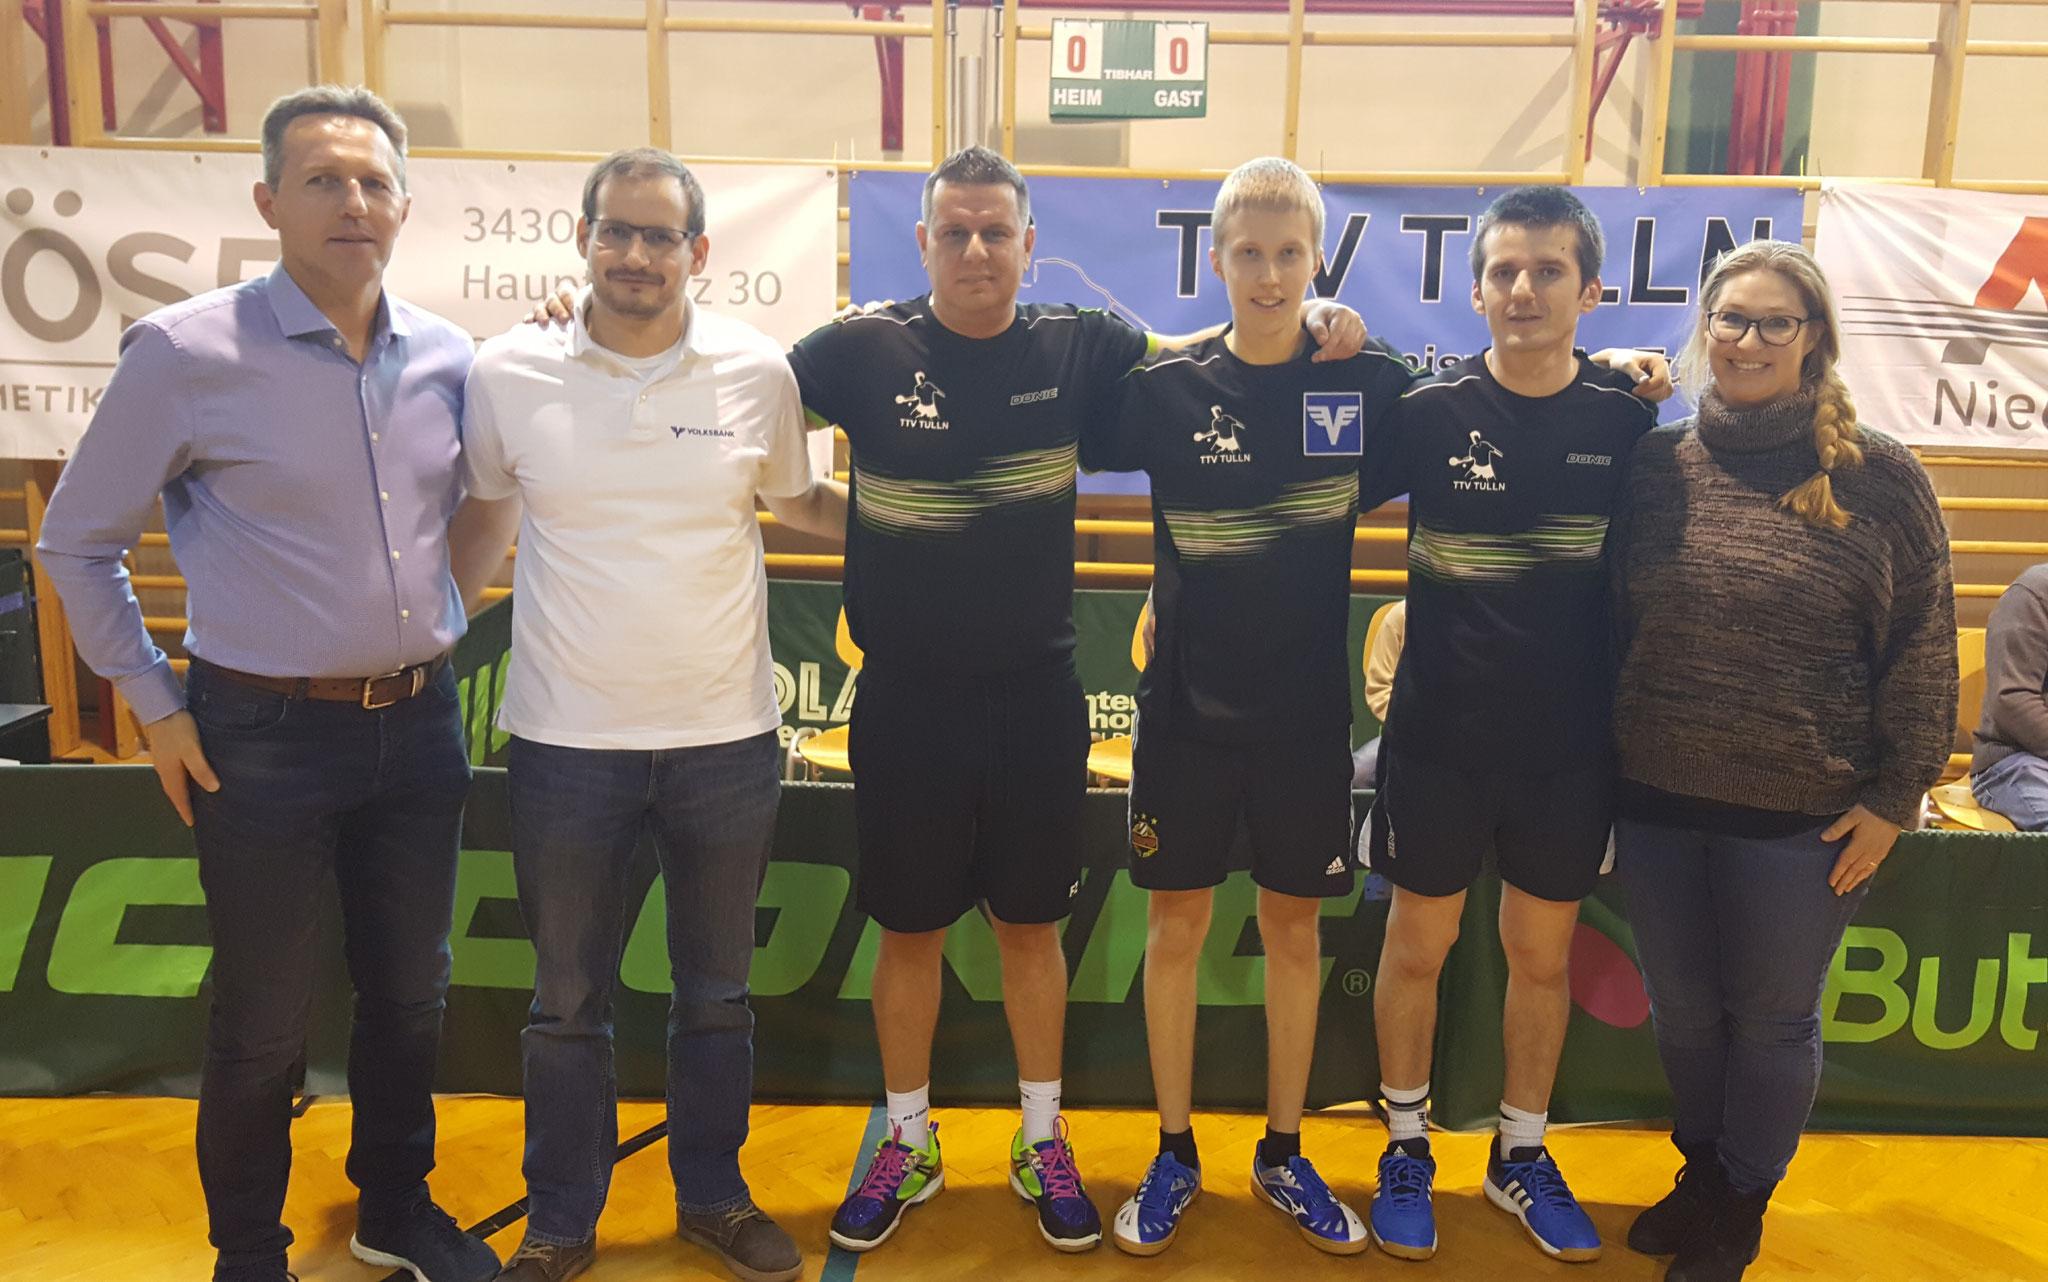 Meistertitel in der 2. Landesliga (2017/18) mit Wolfgang Mayrhofer, Markus Francan und Birgitt Krenn-Bösel